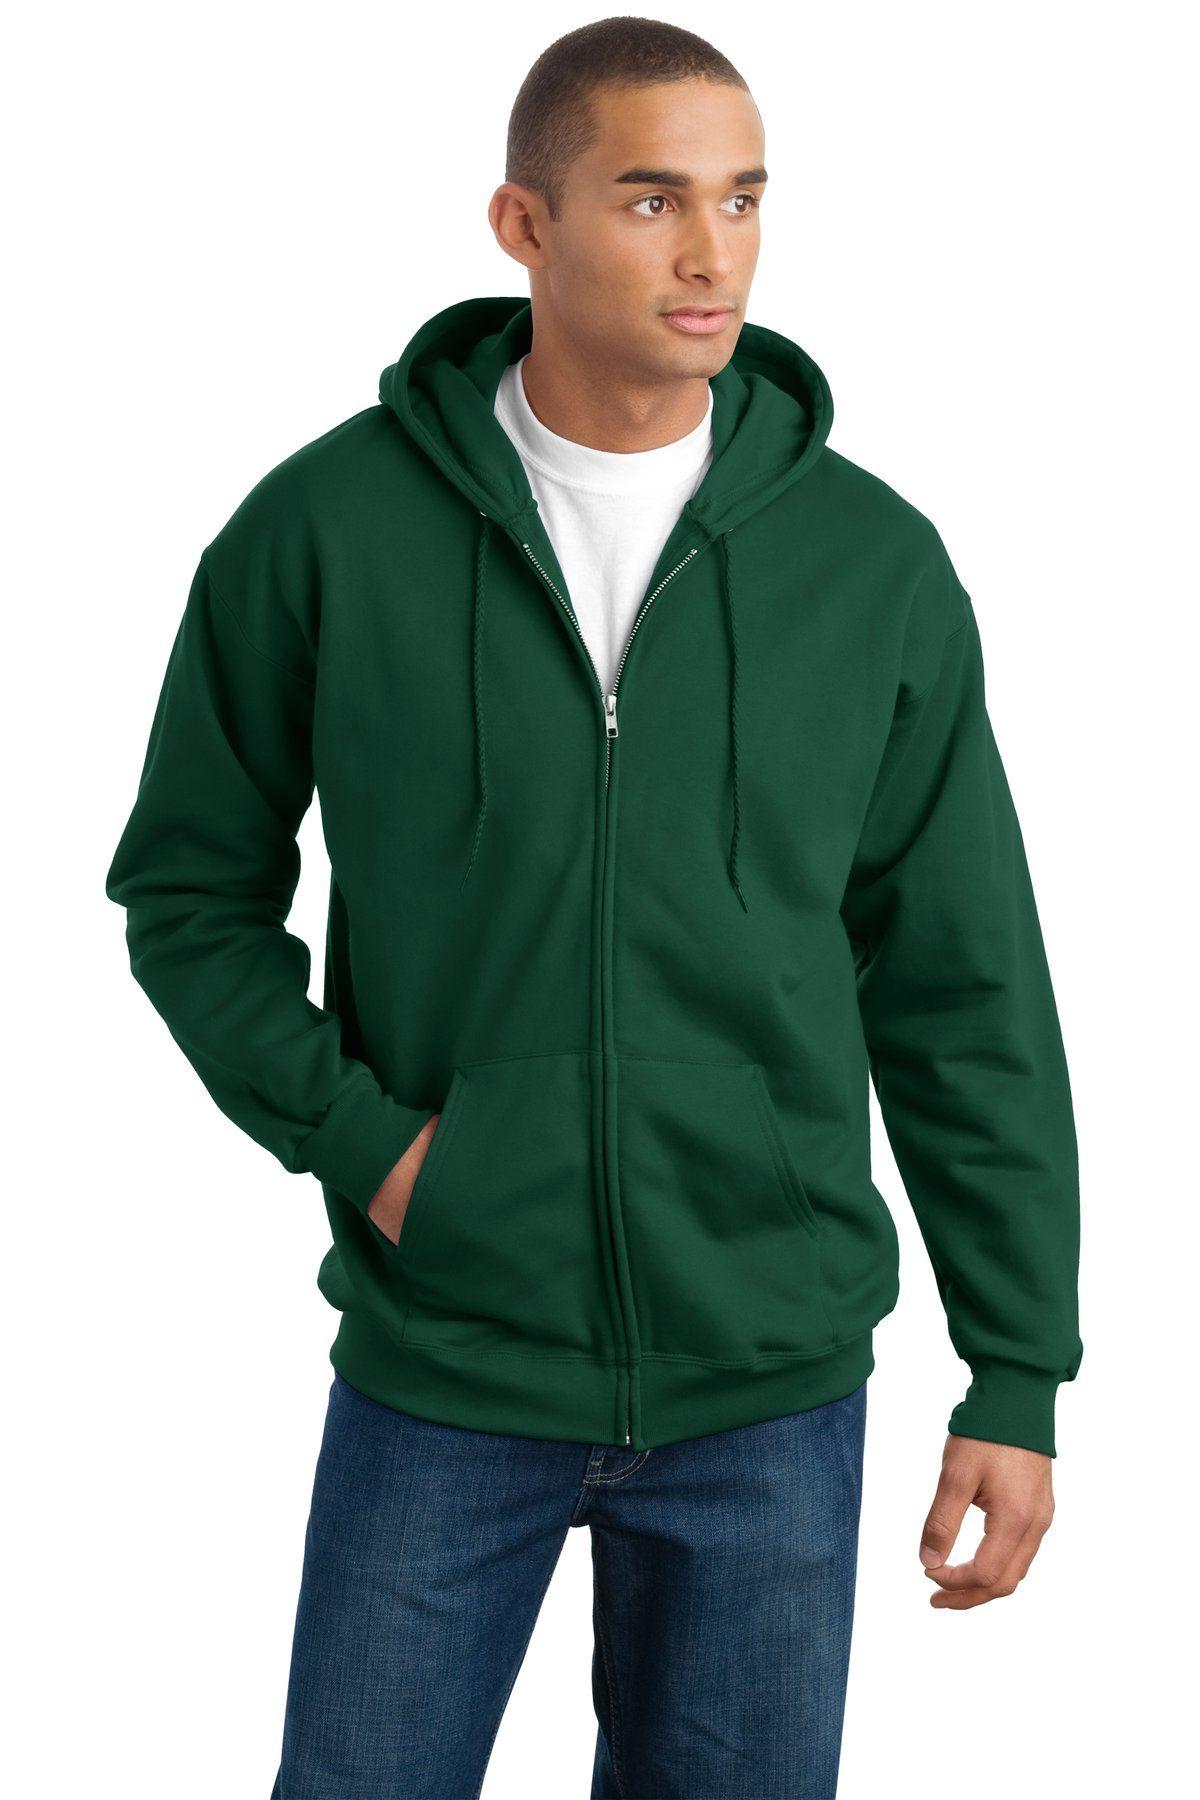 Hanes Hanes Men S Ultimate Cotton Full Zip Hooded Sweatshirt F283 Walmart Com Hooded Sweatshirts Hanes Sweatshirts Pullover Sweater Men [ 1800 x 1200 Pixel ]